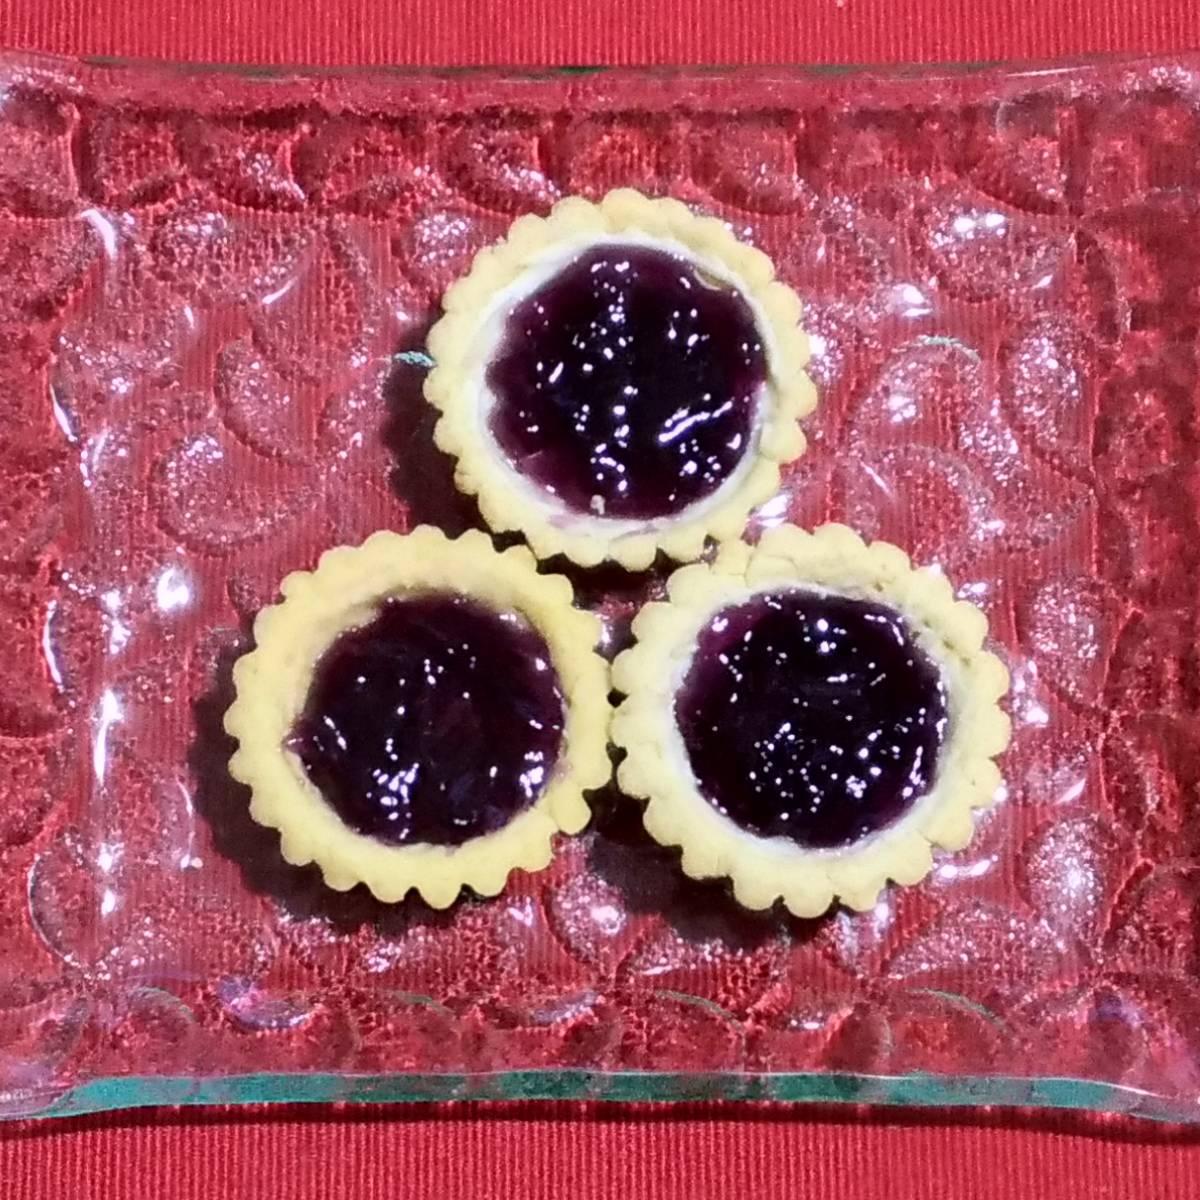 Mini Pie Blueberry Original Crust (paket 3 Pieces)1